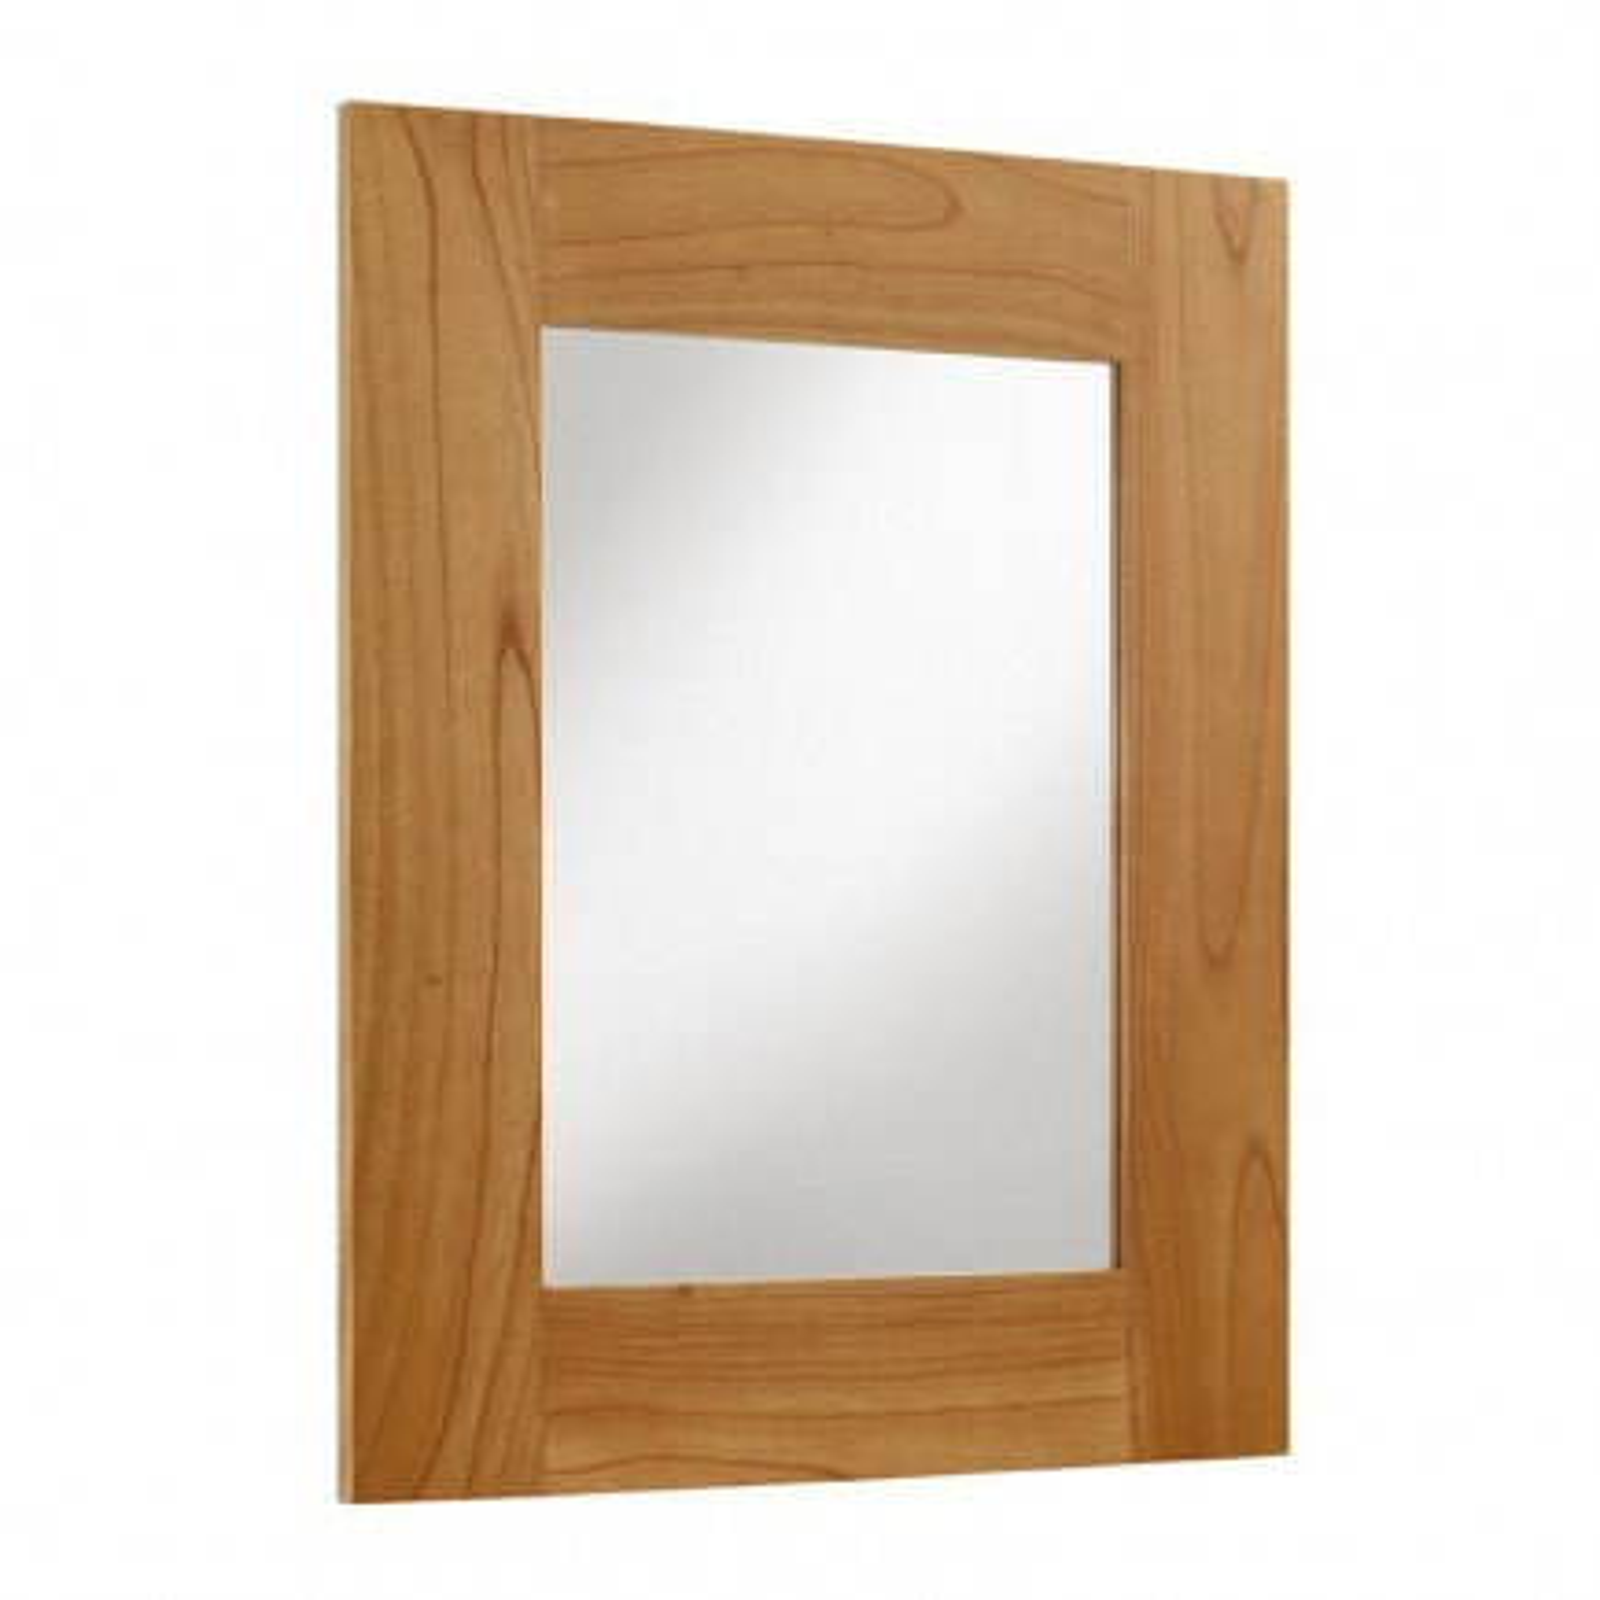 Miroir rectangulaire PM Beaubois Mindy Massif